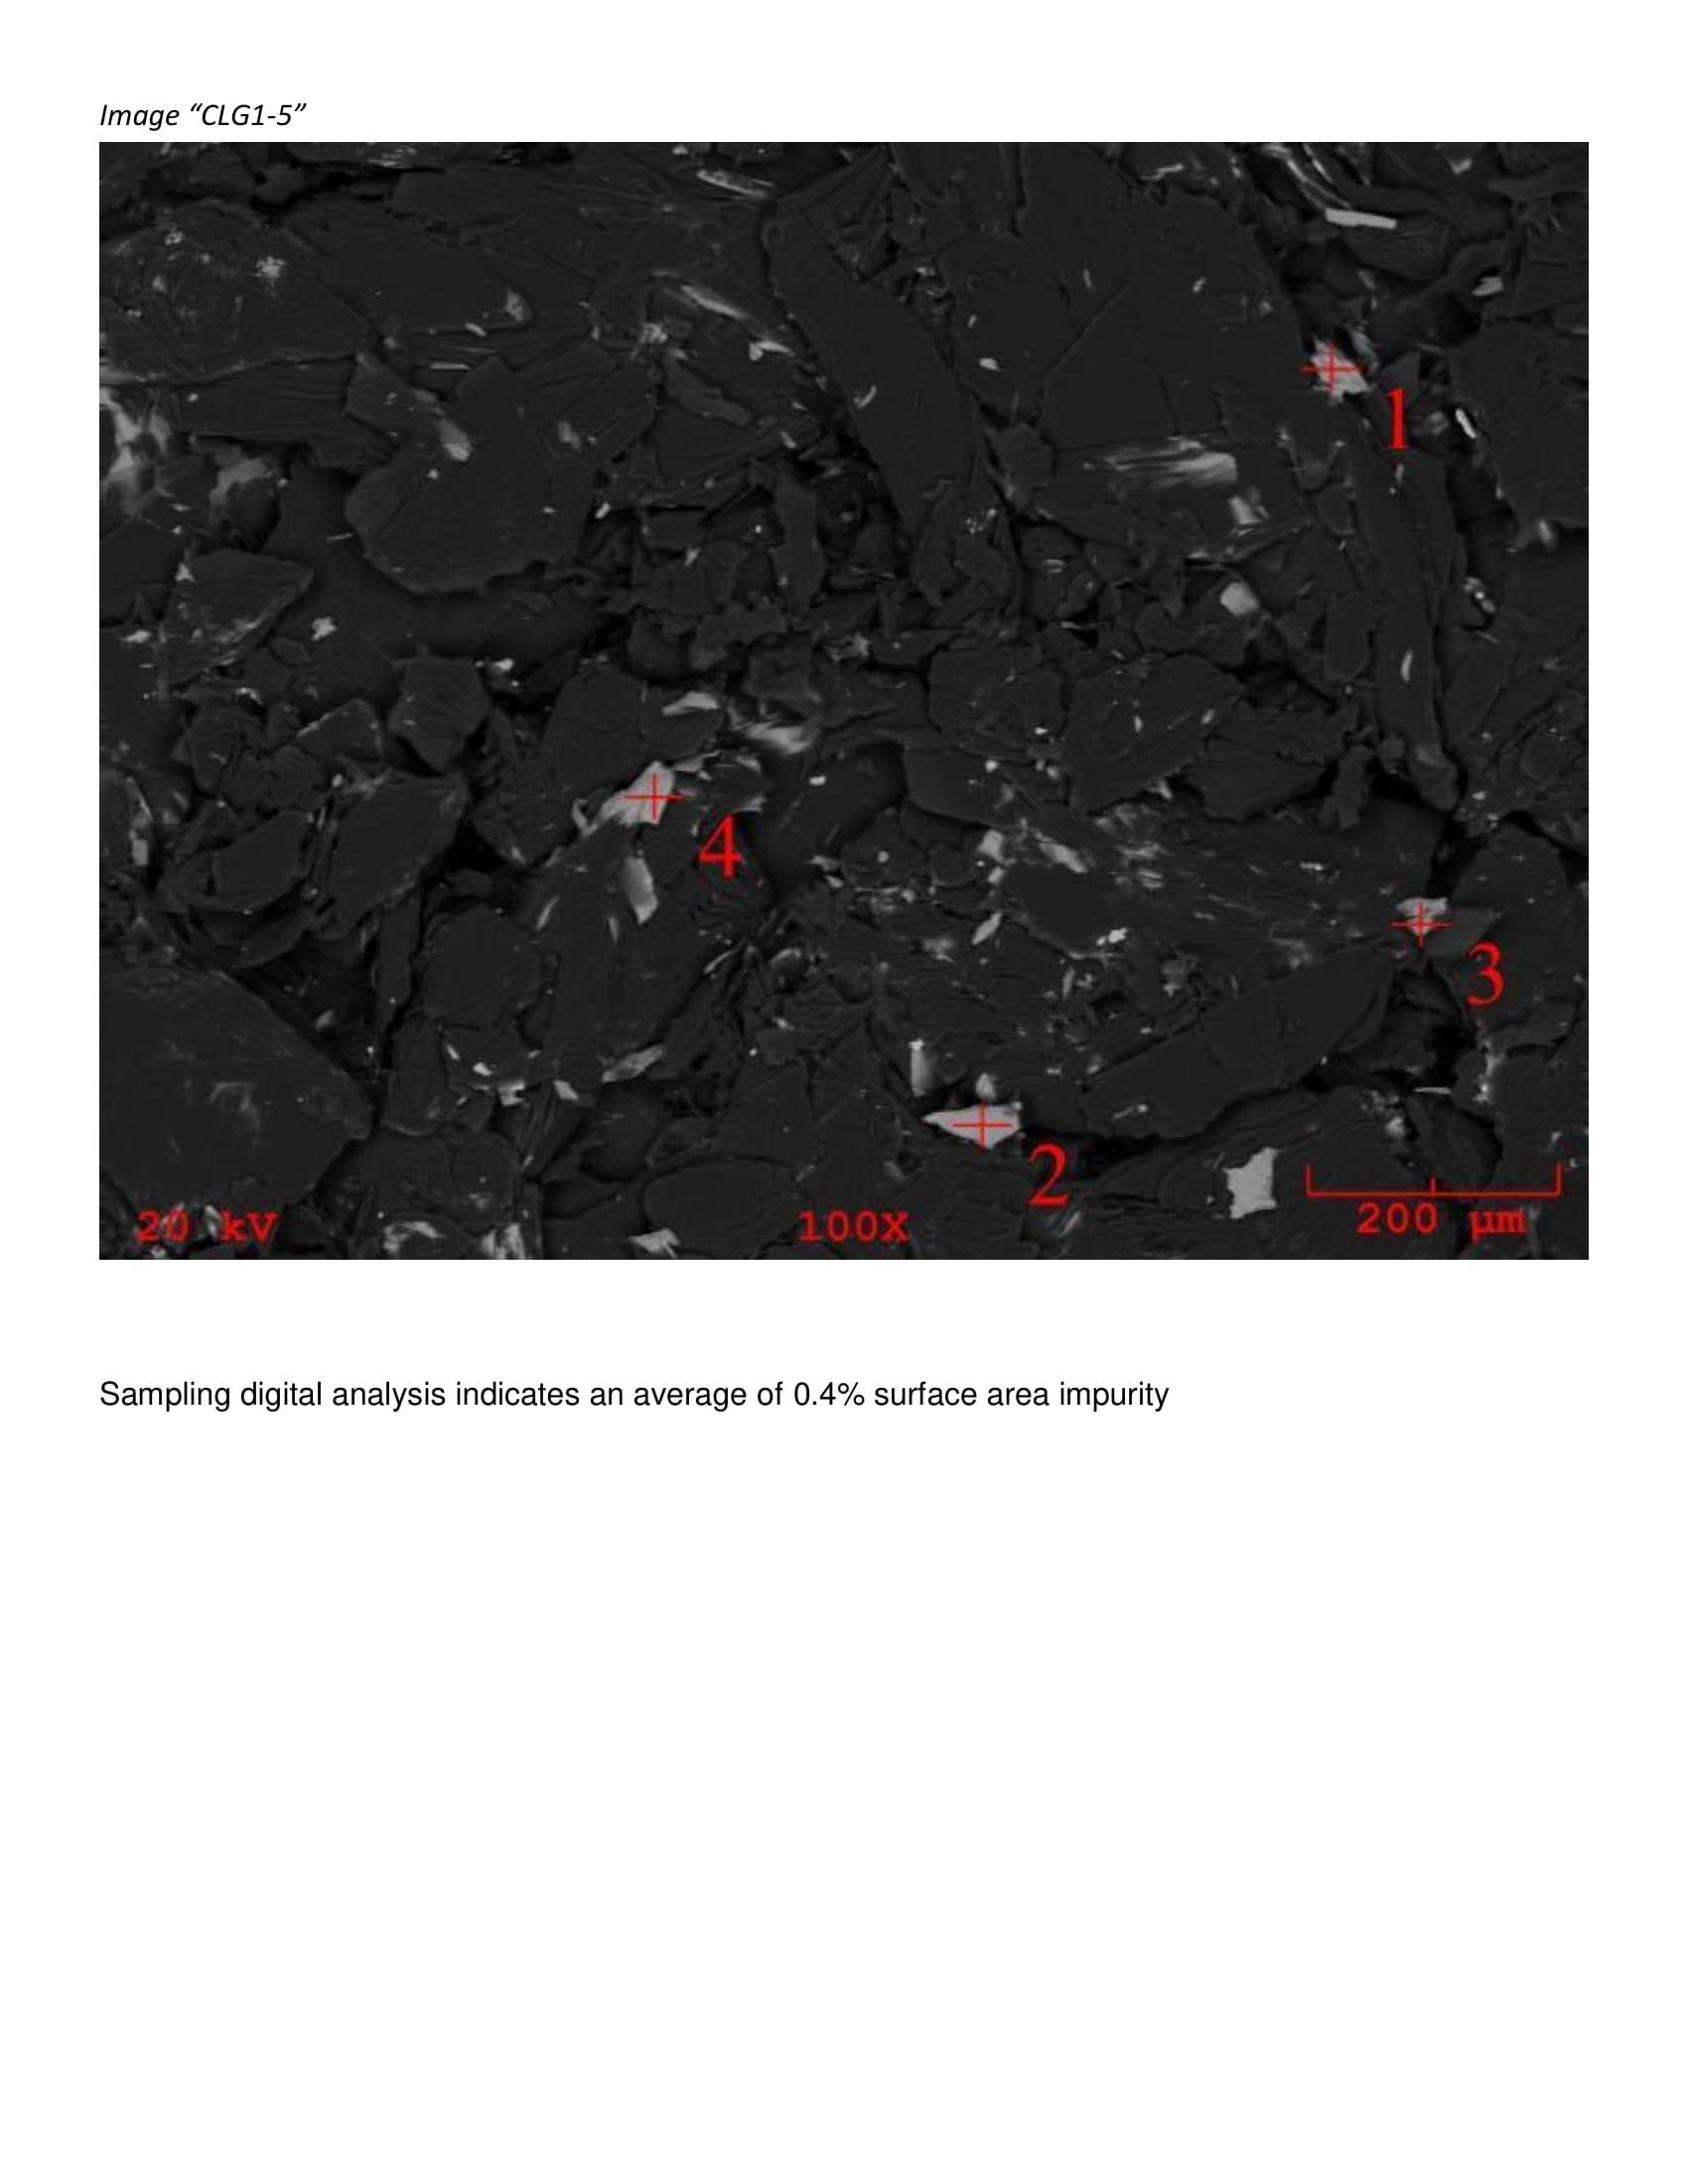 RSM Graphite-SEM-131014-4.jpg